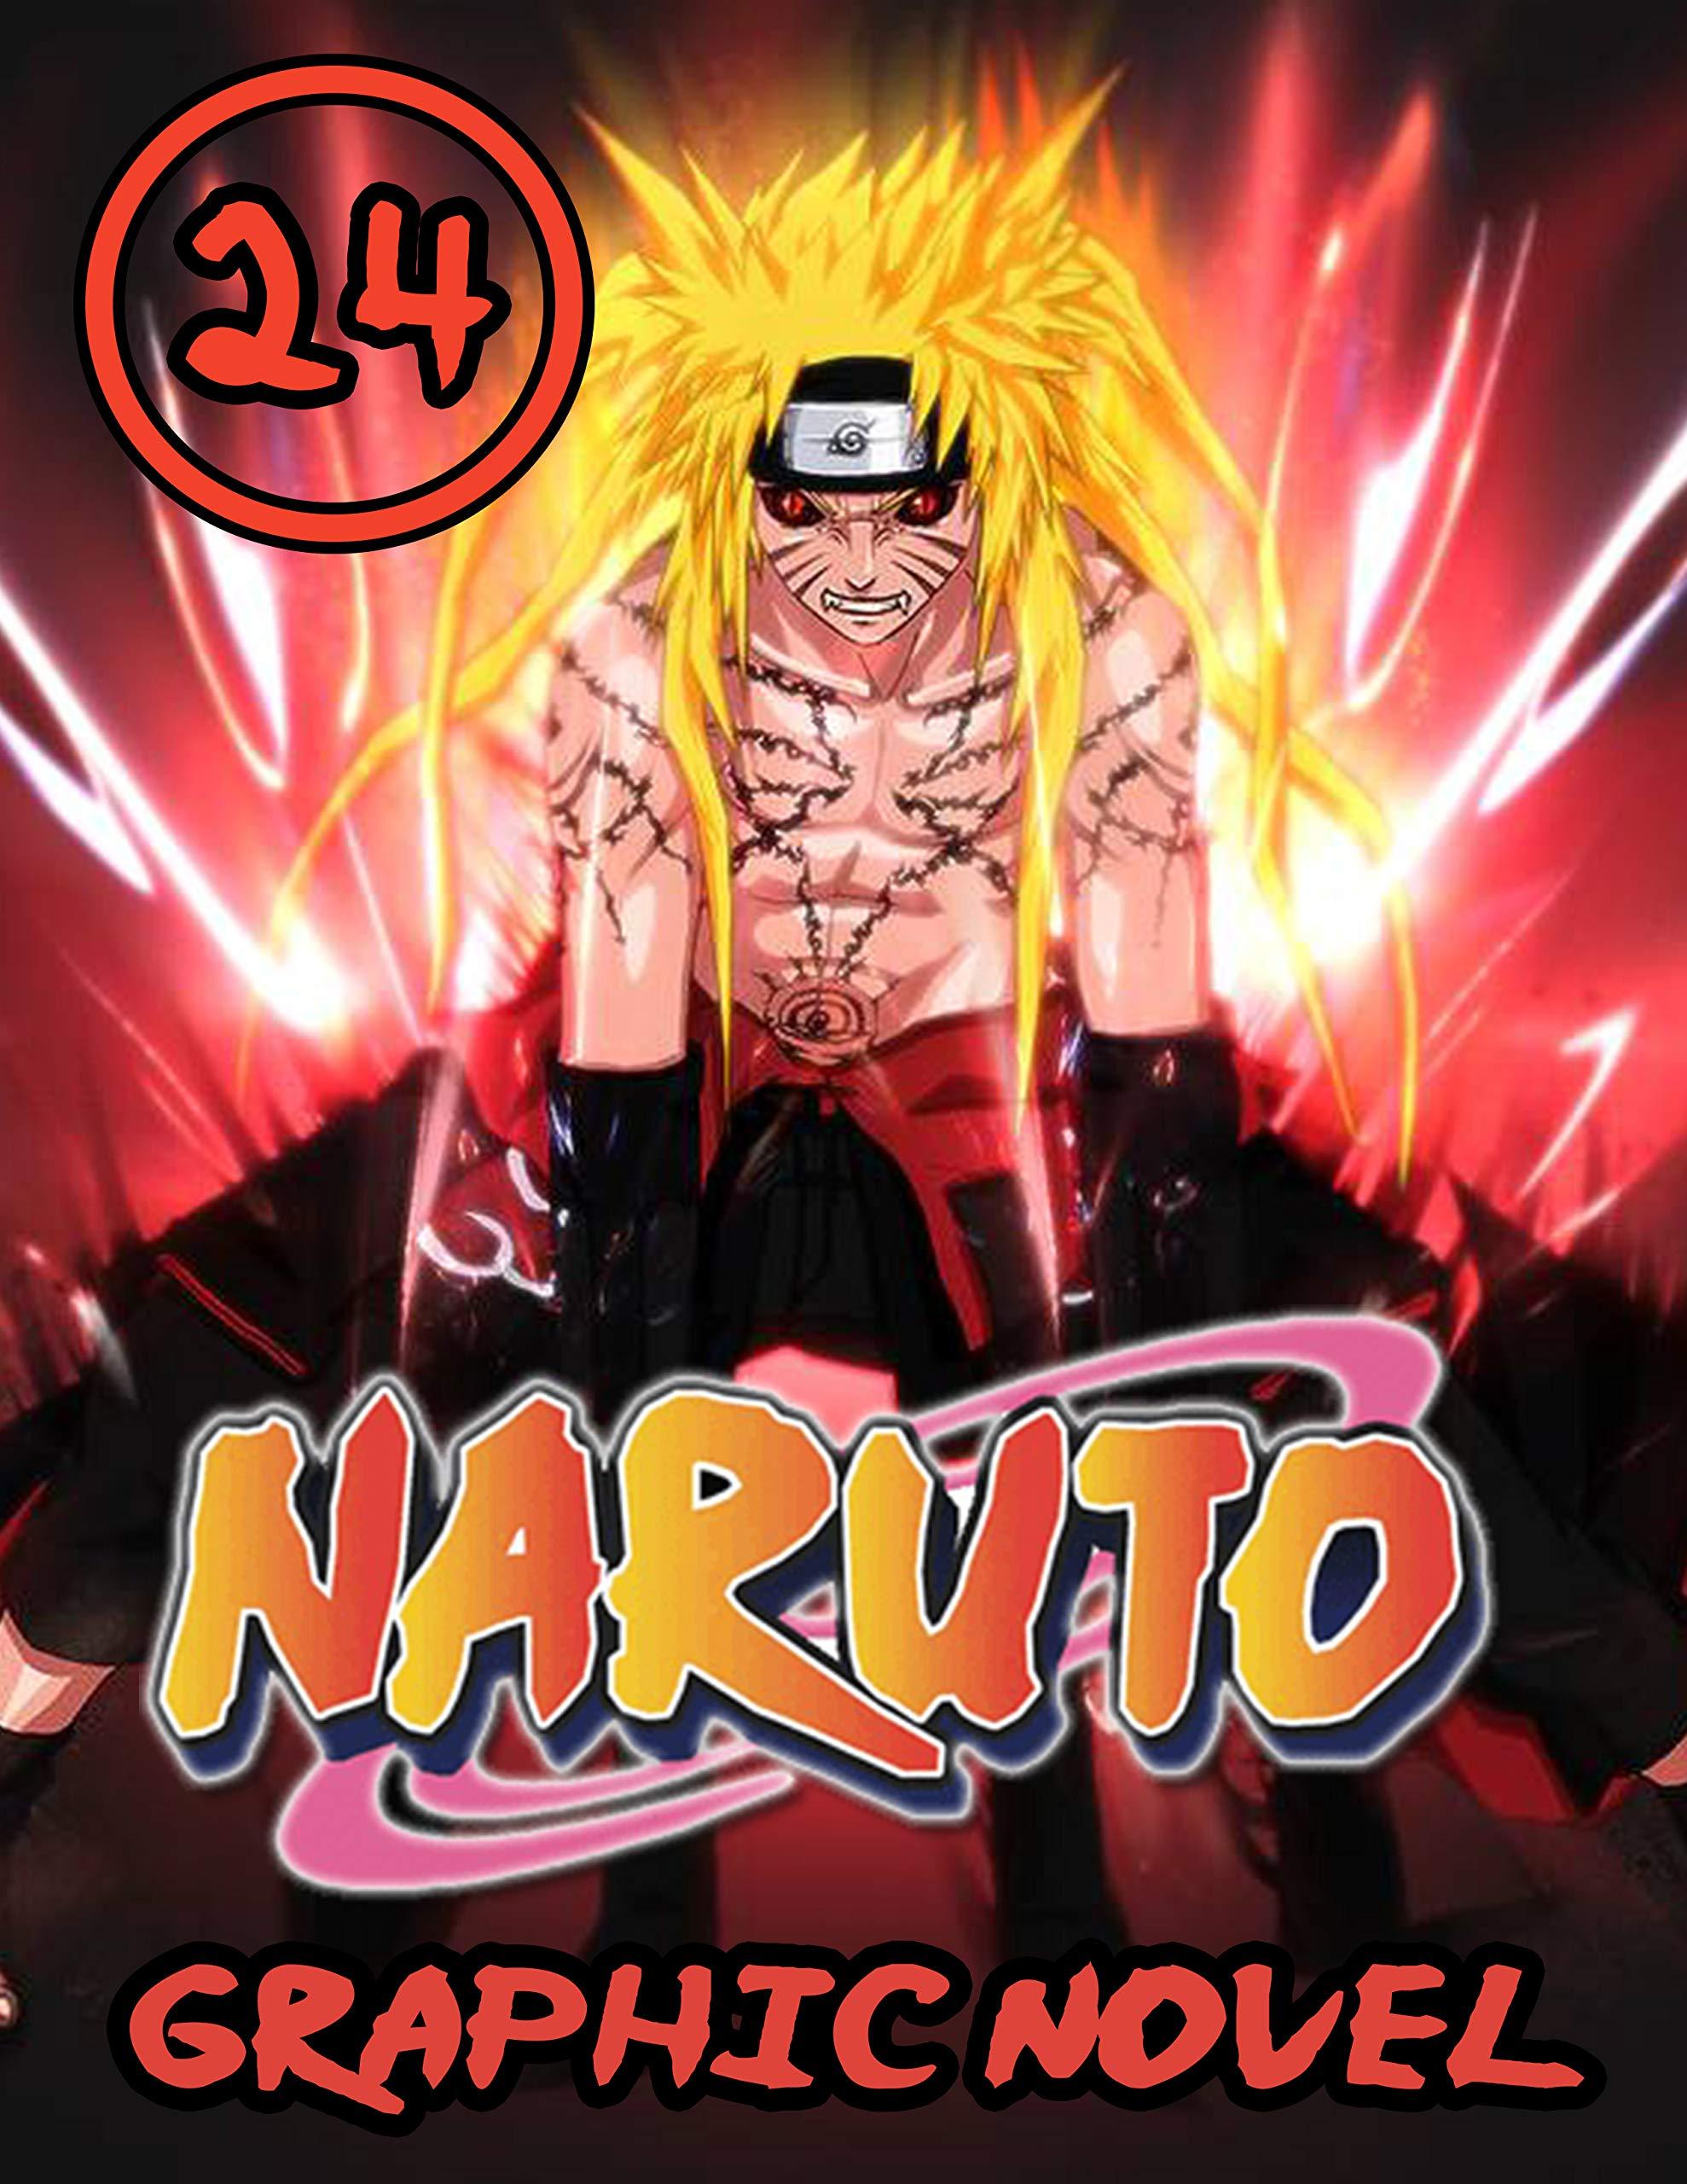 Naruto Graphic Novel: Vol 24 - Full Color Great Shounen Manga For Young & Teens , Adults